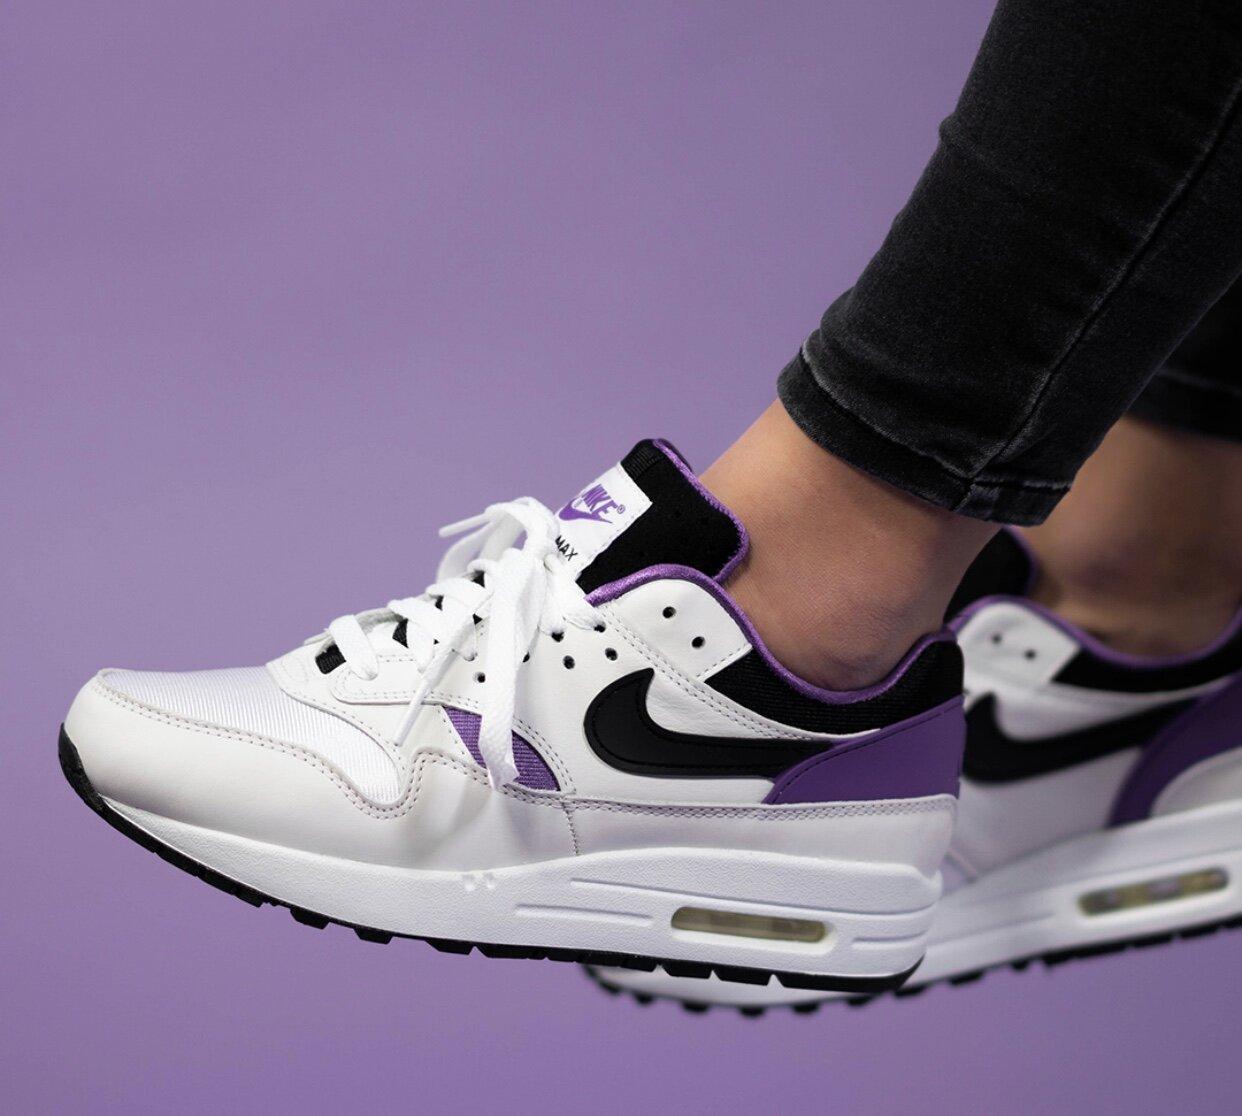 Bigote vertical Un pan  Wish List: Nike Air Max 1 DNA in 'Purple Punch' — CNK Daily (ChicksNKicks)